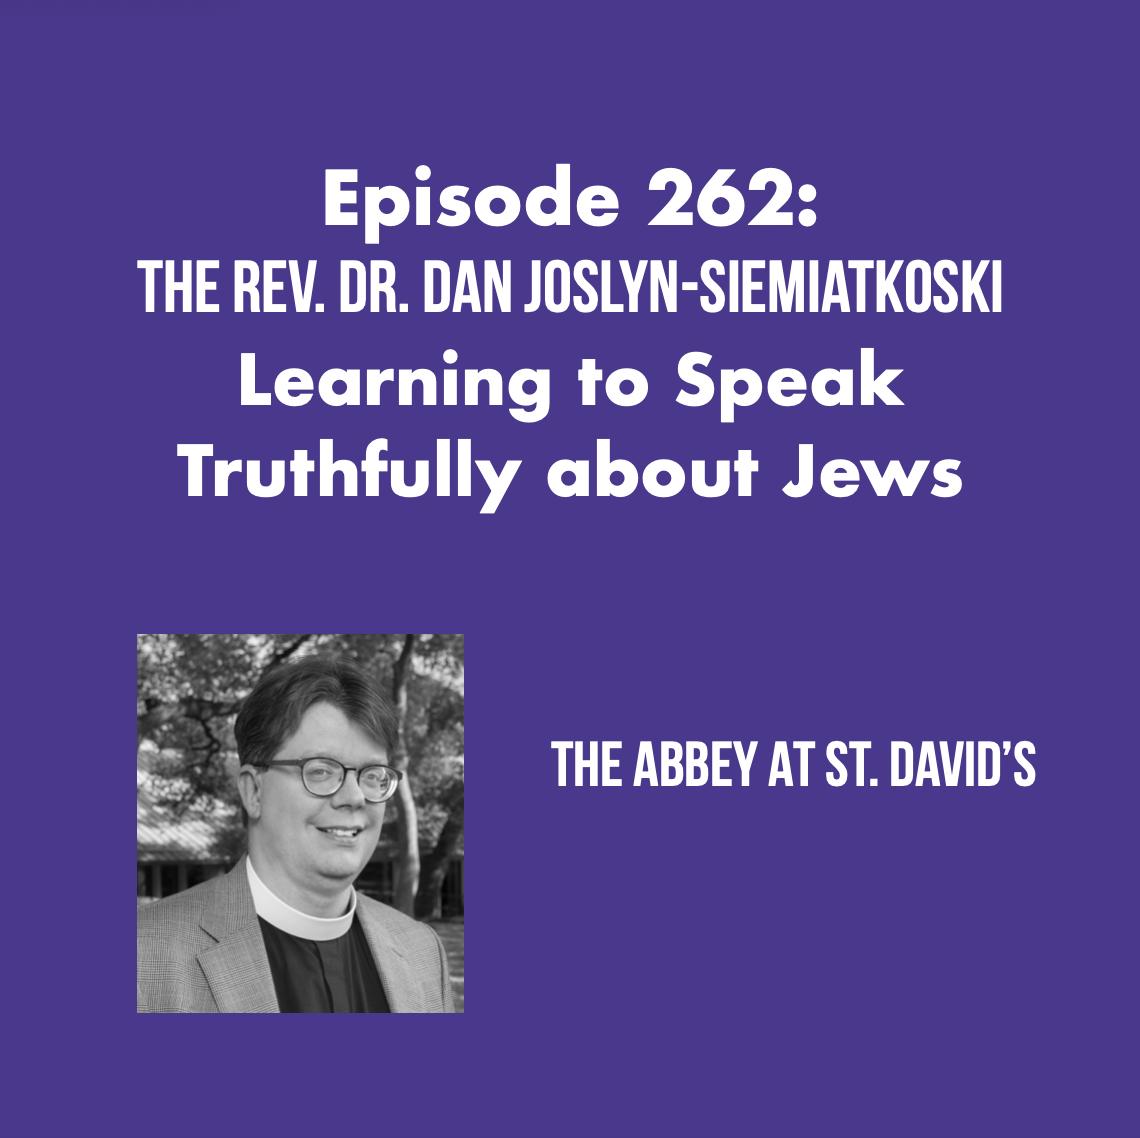 Episode 262: Learning To Speak Truthfully About Jews with The Rev. Dr. Dan Joslyn-Siemiatkoski